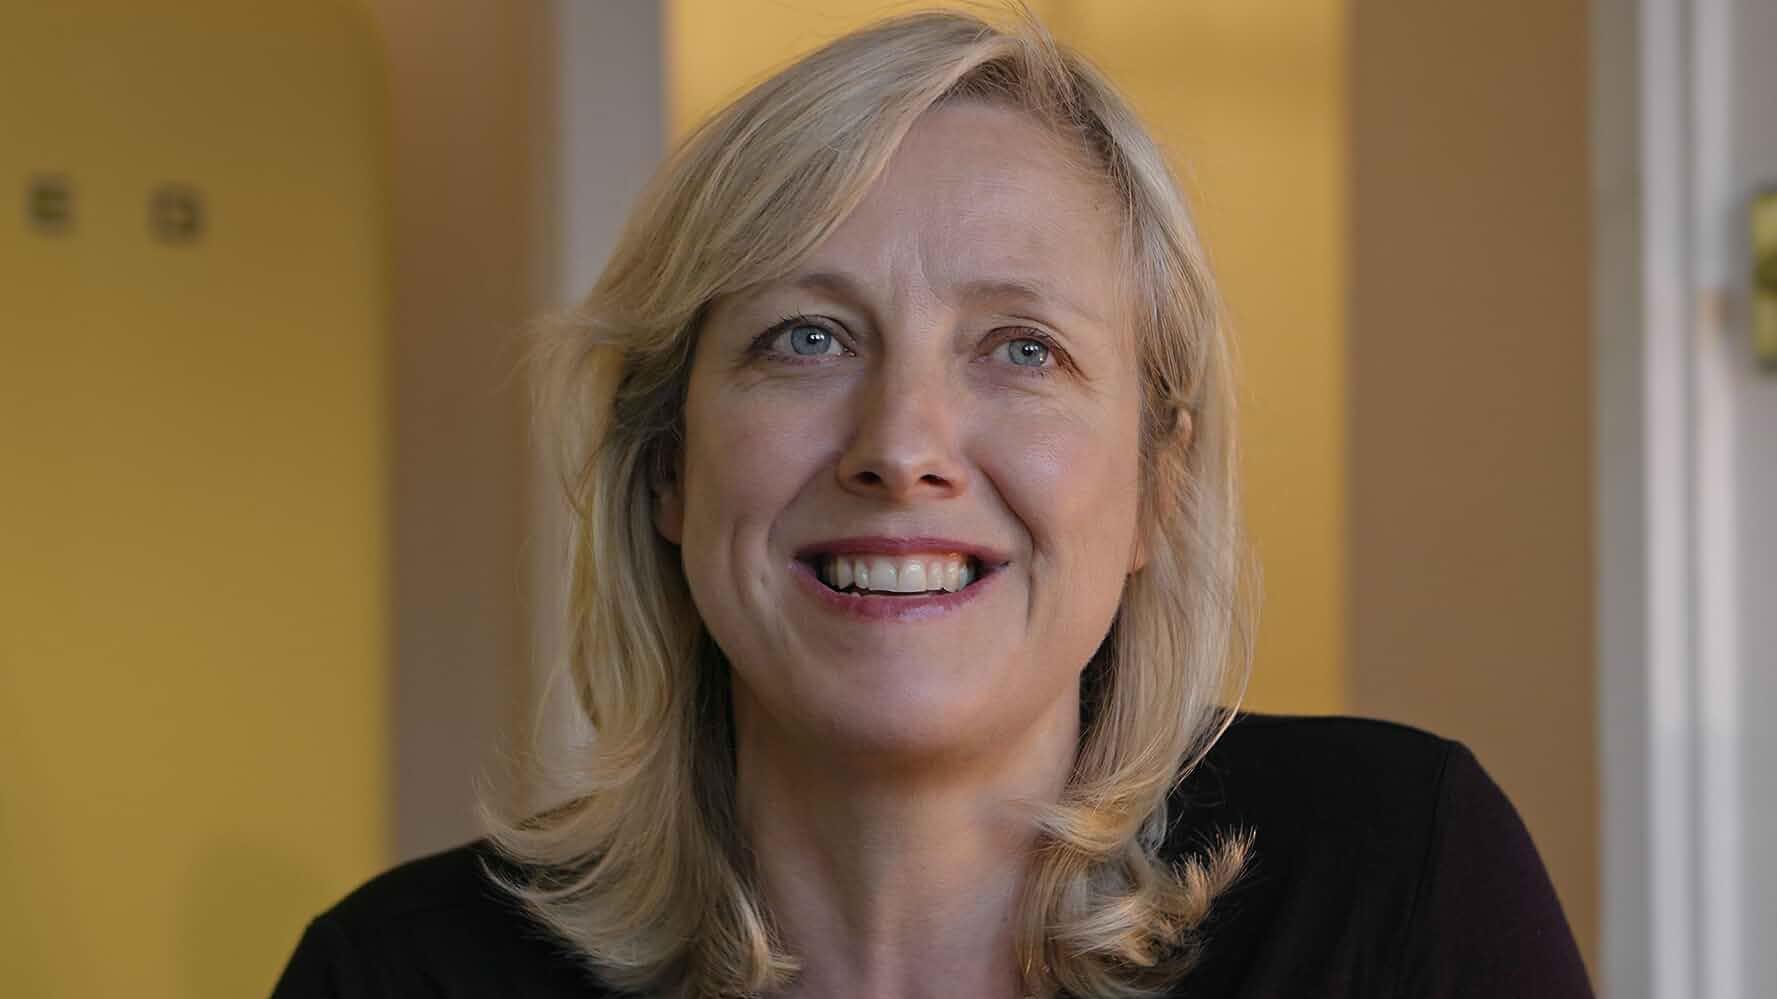 Carole Cadwalladr in The Great Hack (2019)